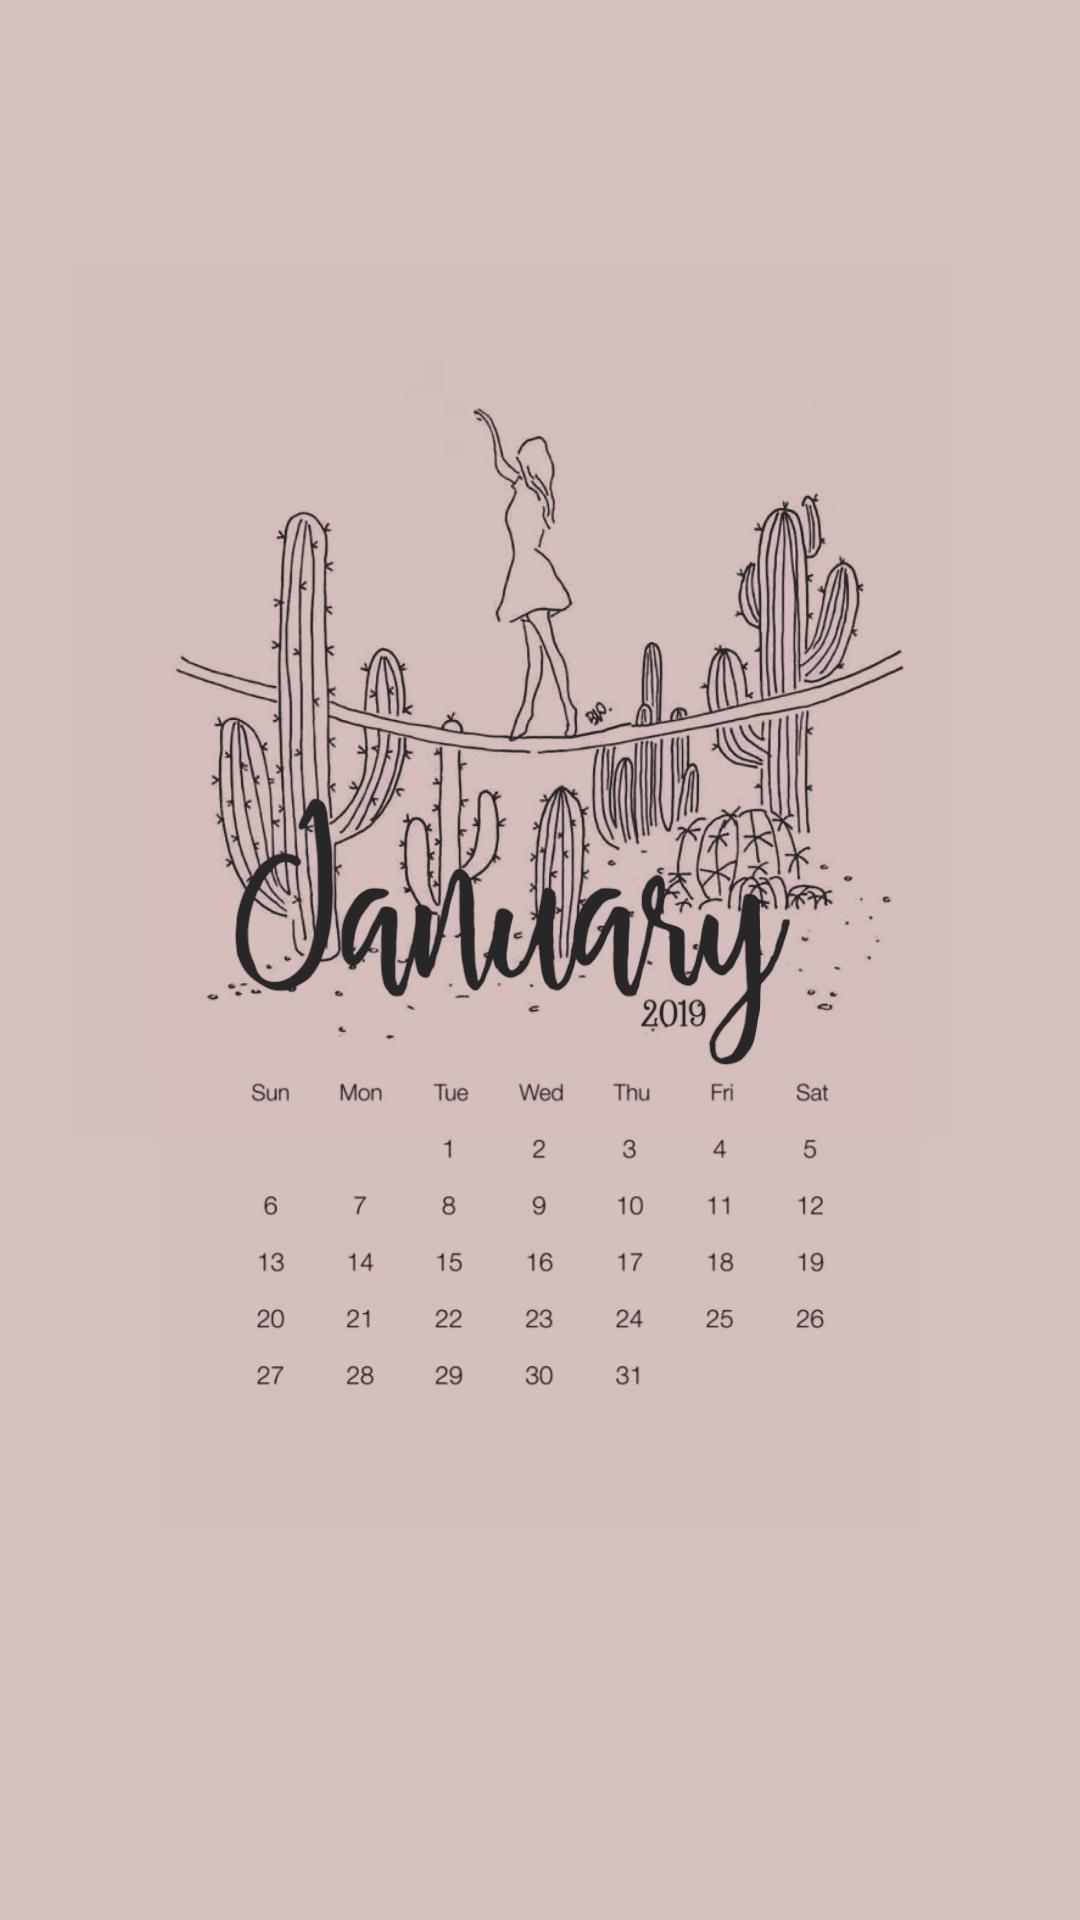 2019 Calendar Printable | Tumblr